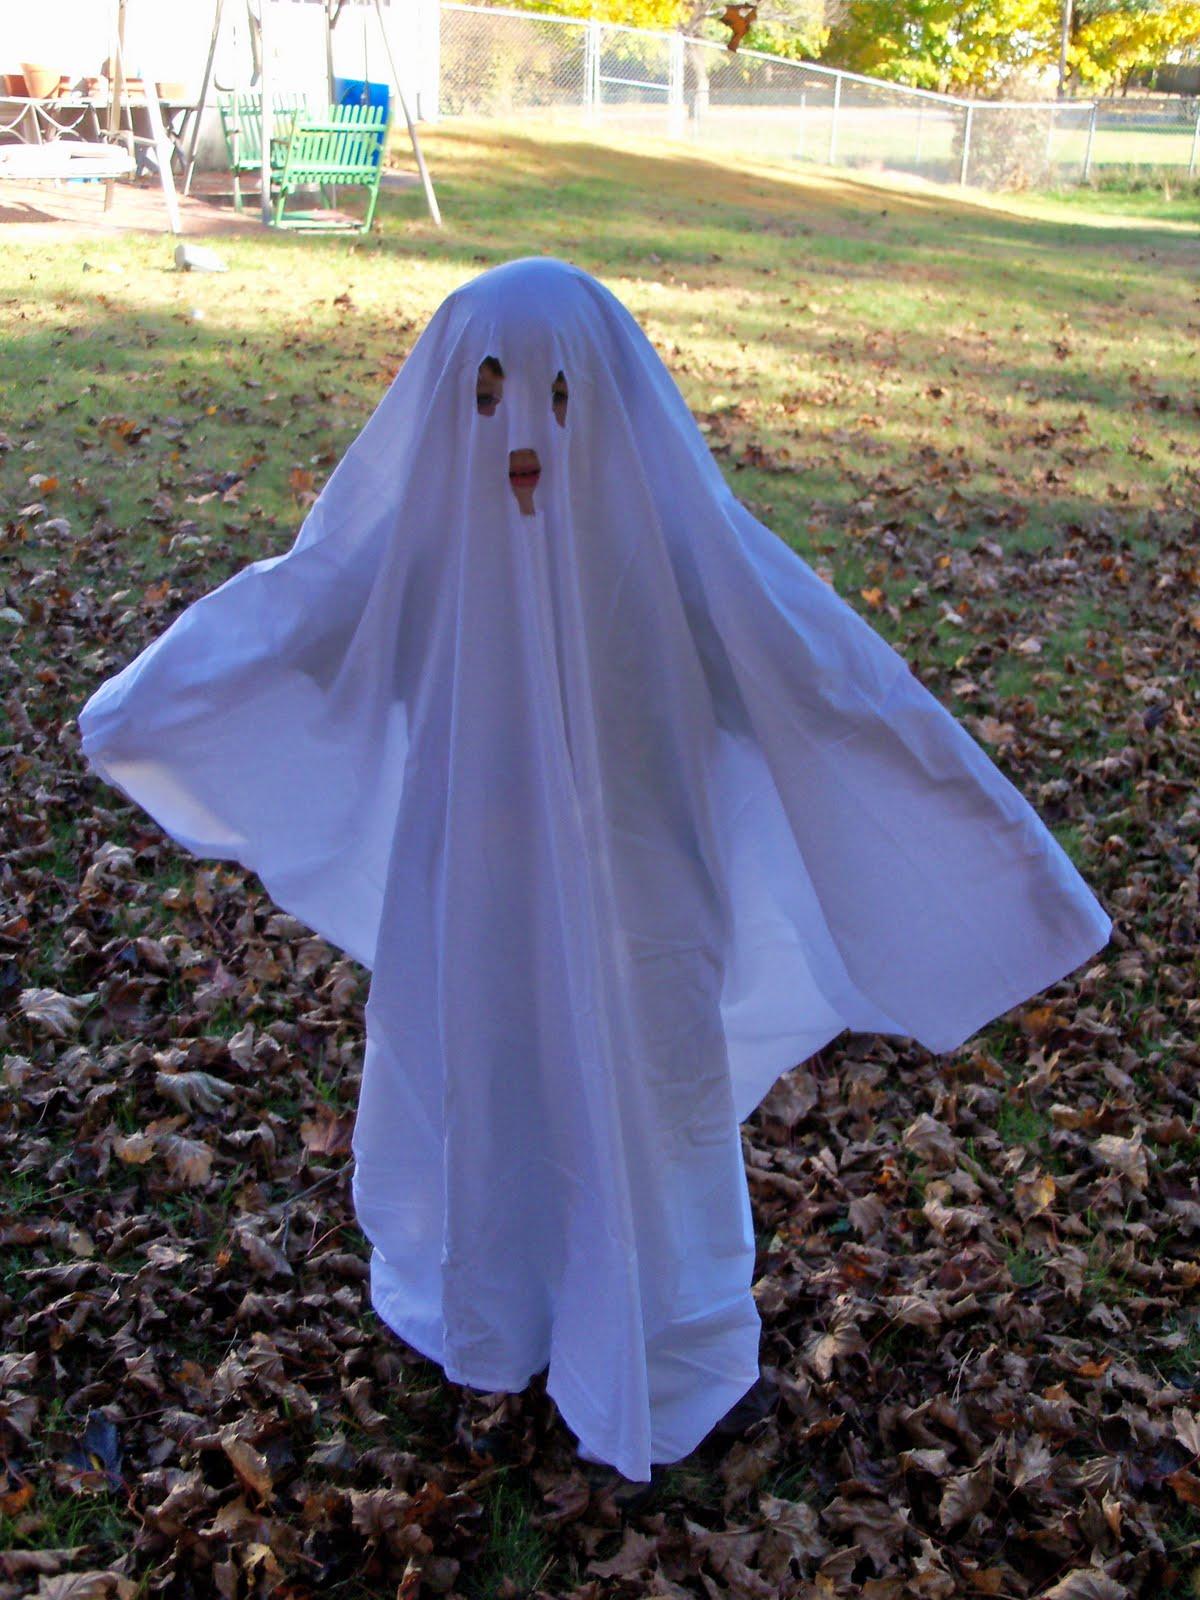 Textiles4you Halloween Round Up & Homemade Ghost Costume - Meningrey